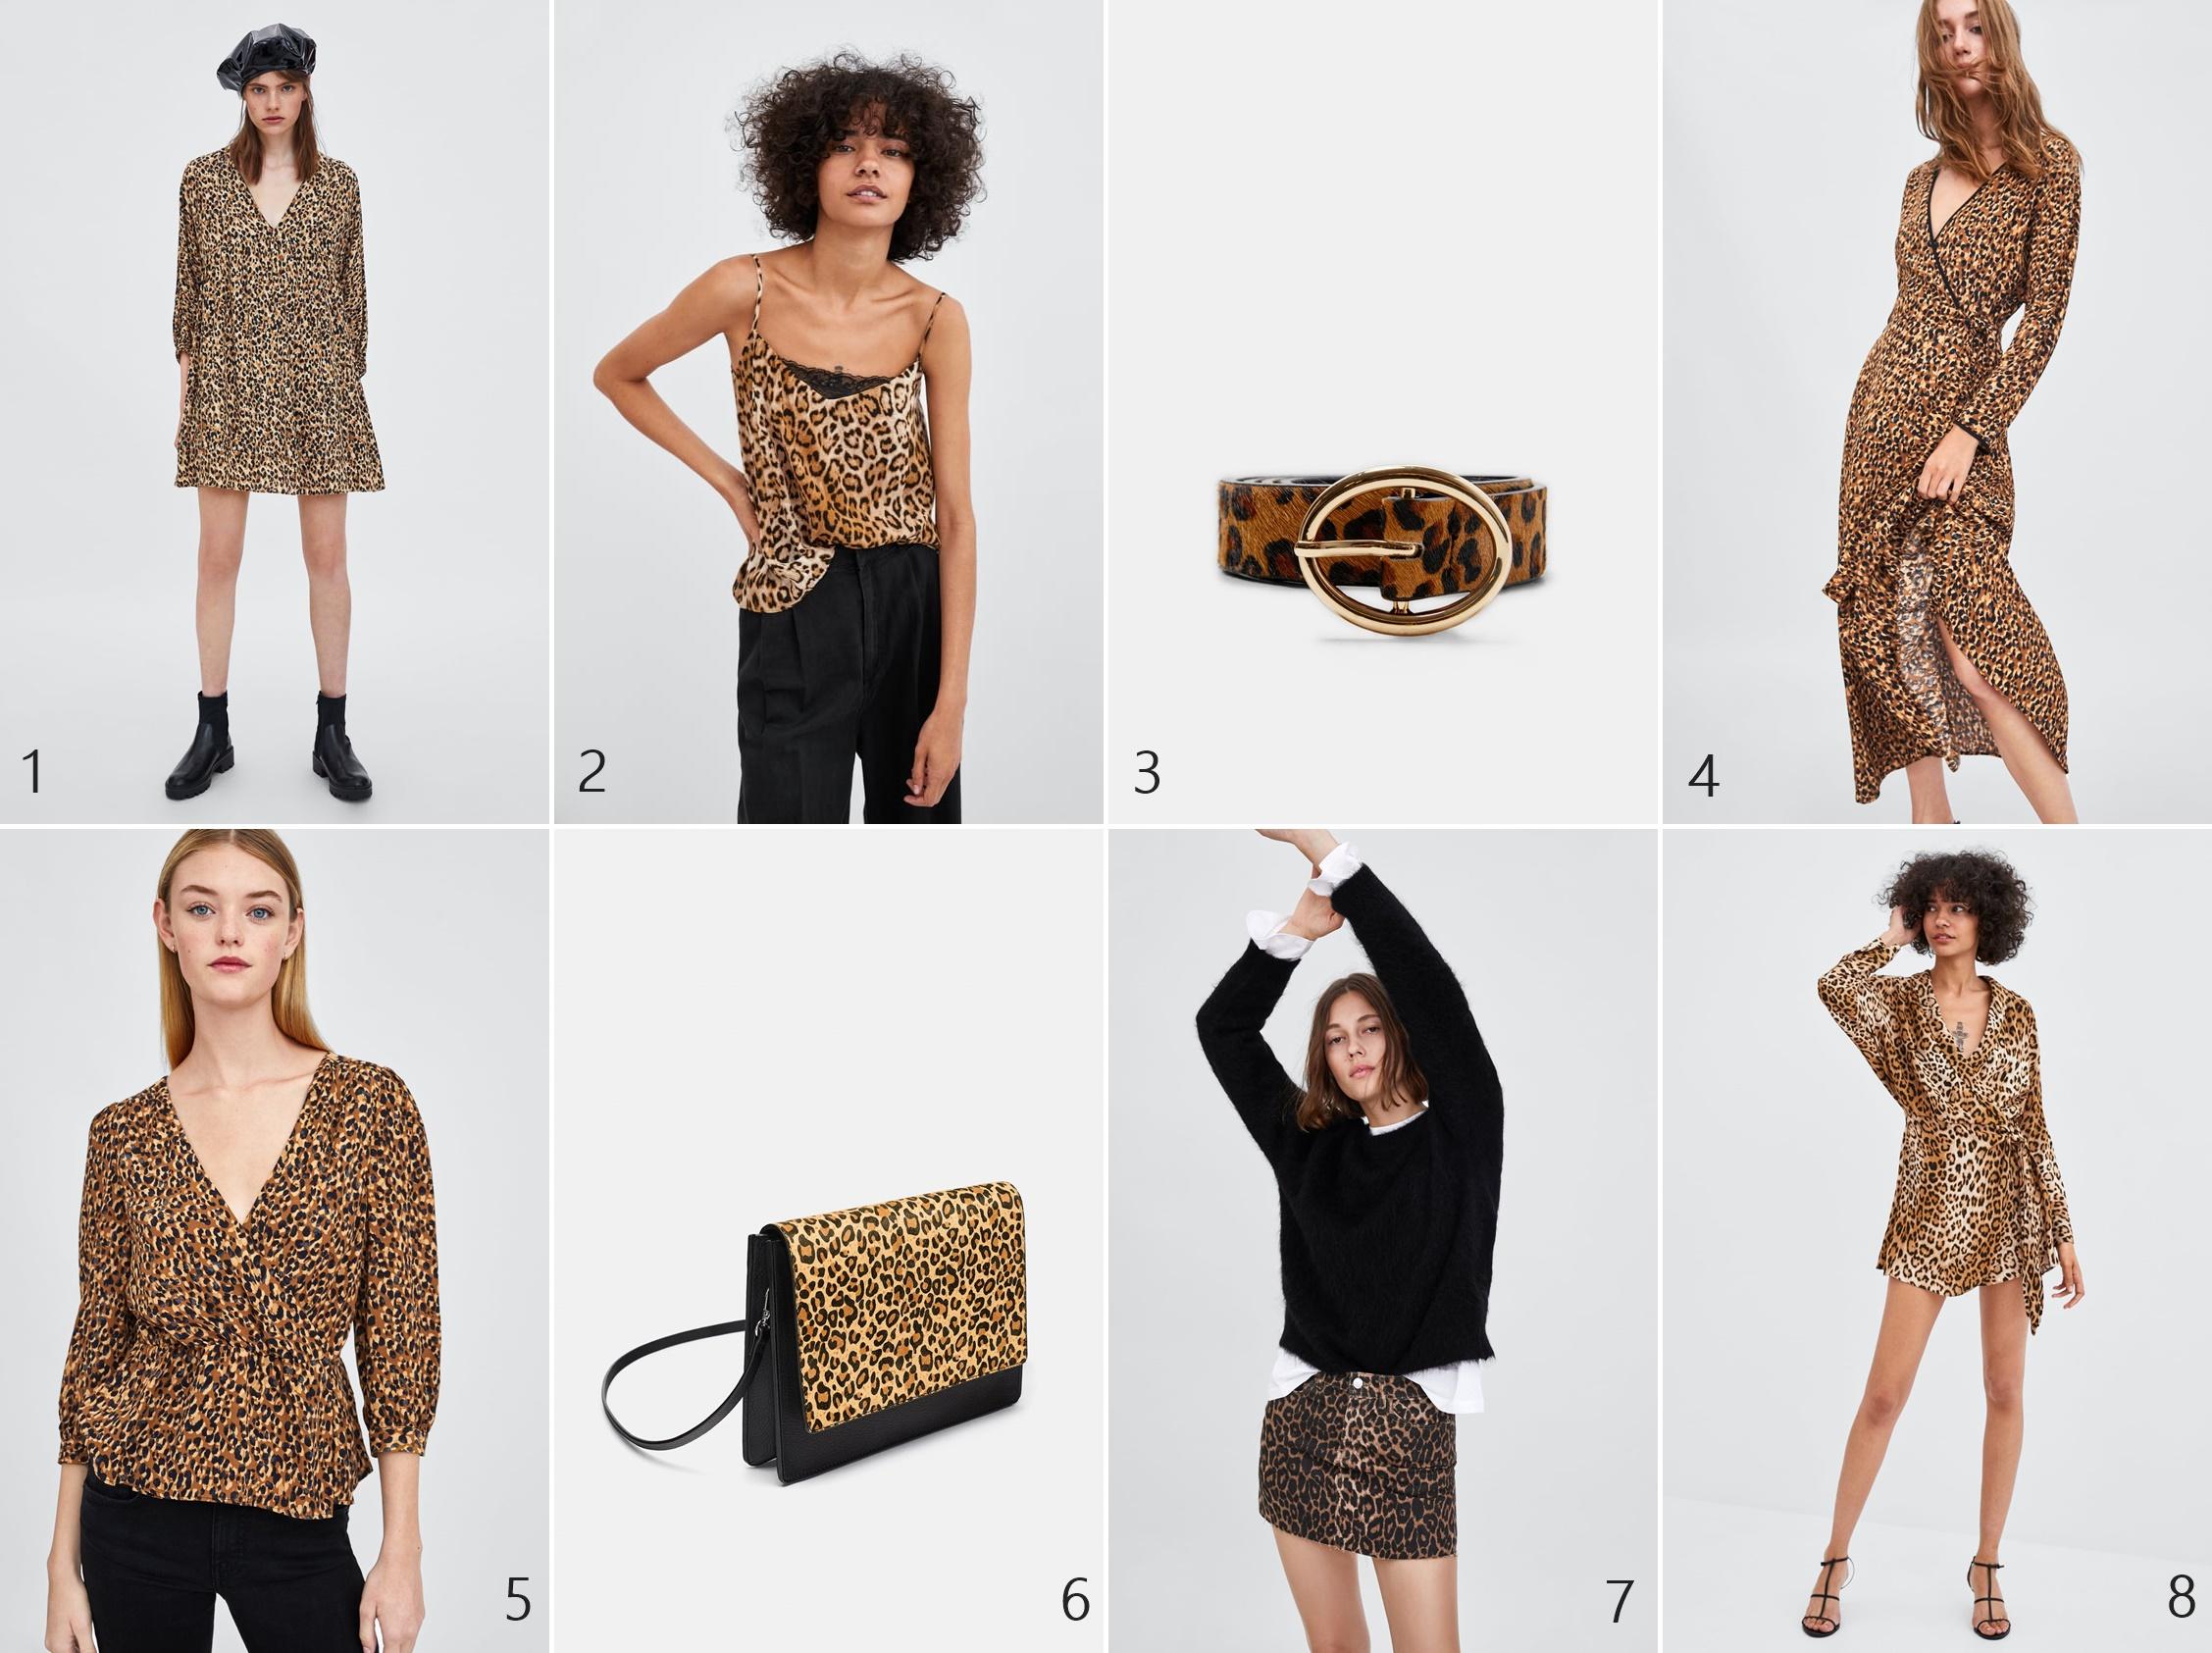 trend-alert-estampado-leopardo-zara-01